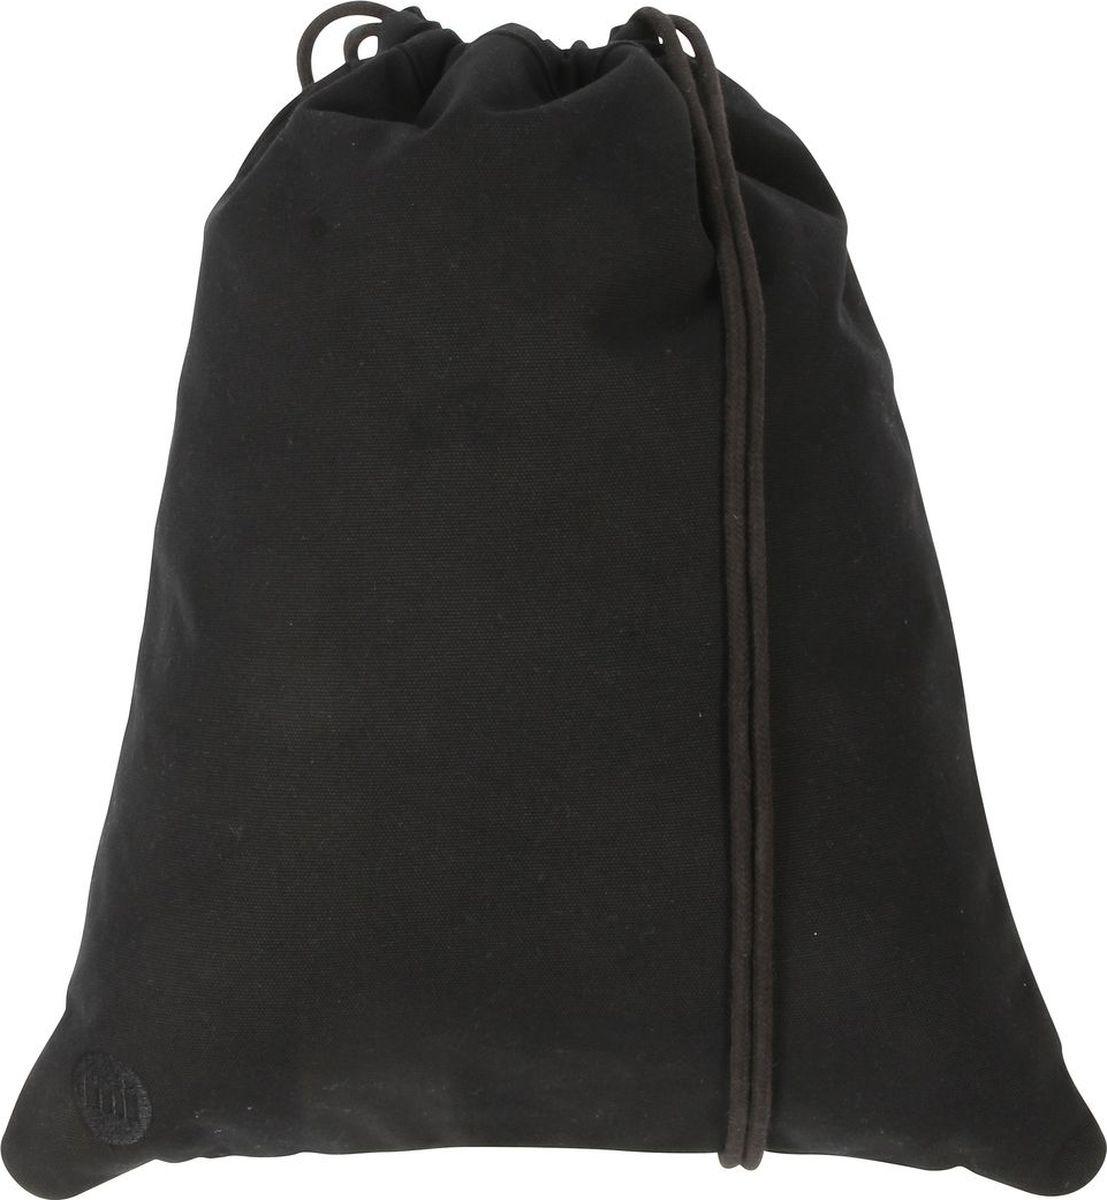 Фото - Сумка Mi-Pac Kit Bag Canvas, 740554-011, черный kaukko fs229 fashion backpack travel bag pure cotton canvas bag